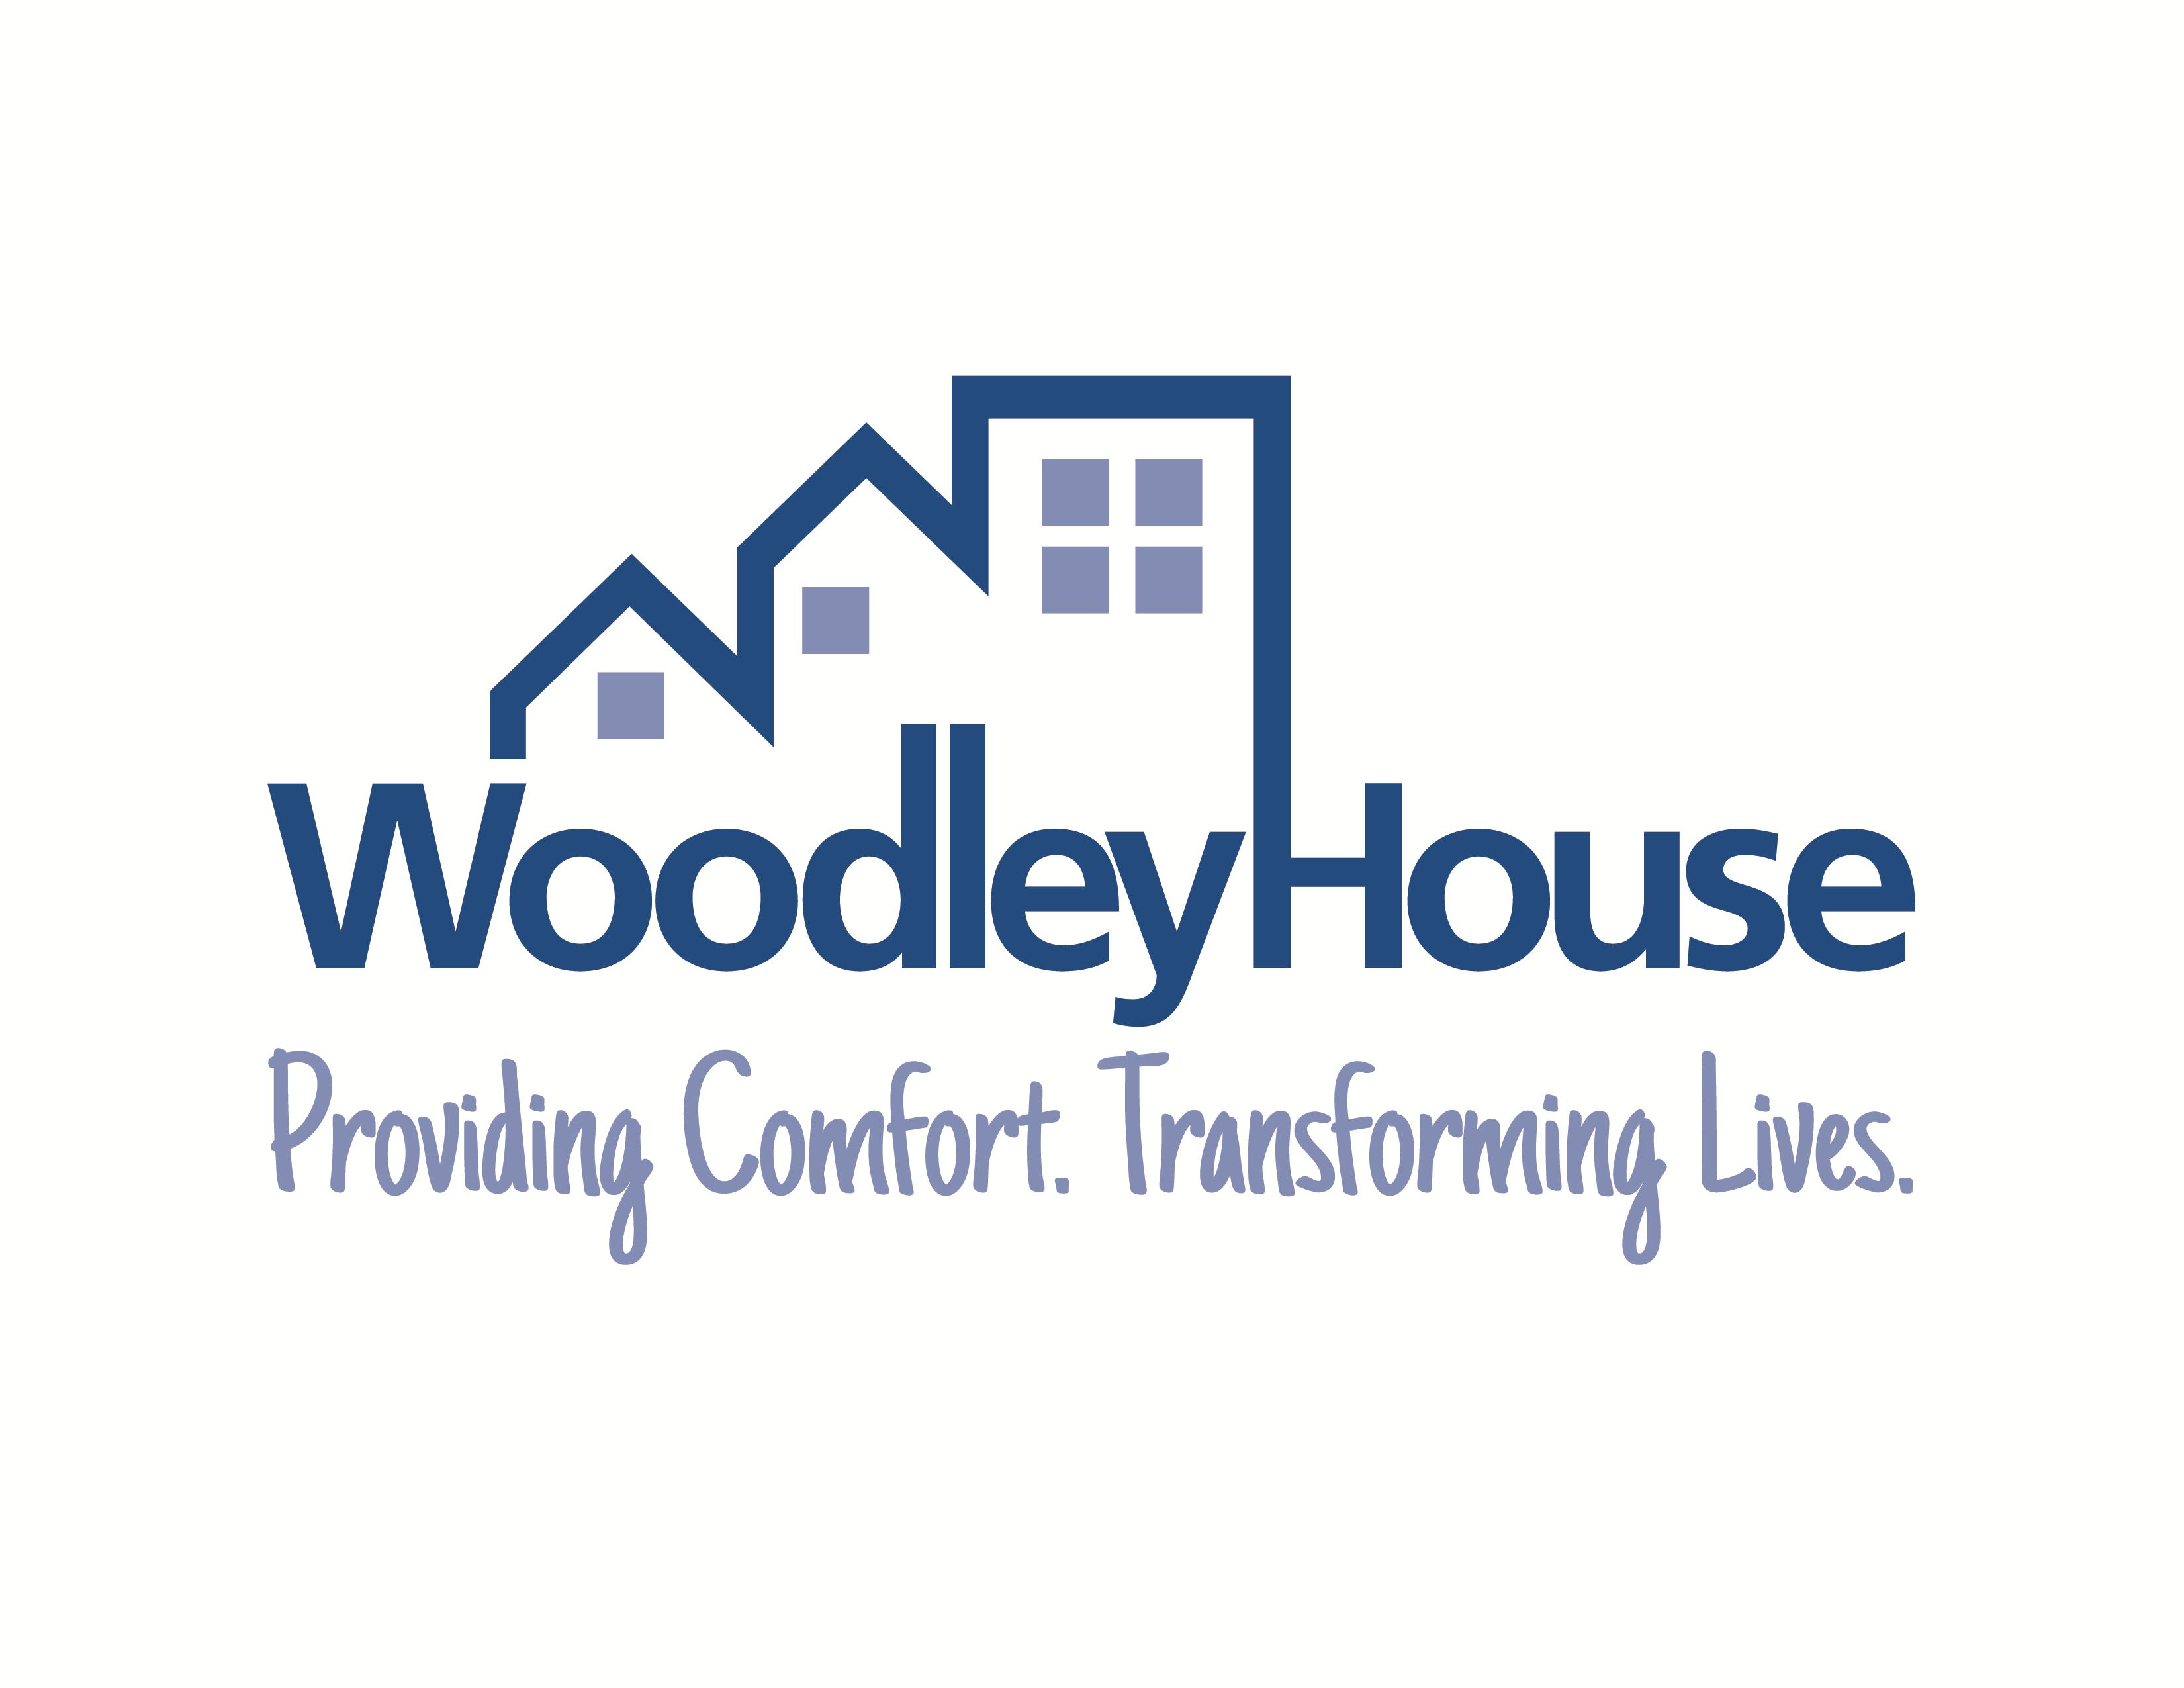 Logo of Woodley House Inc.